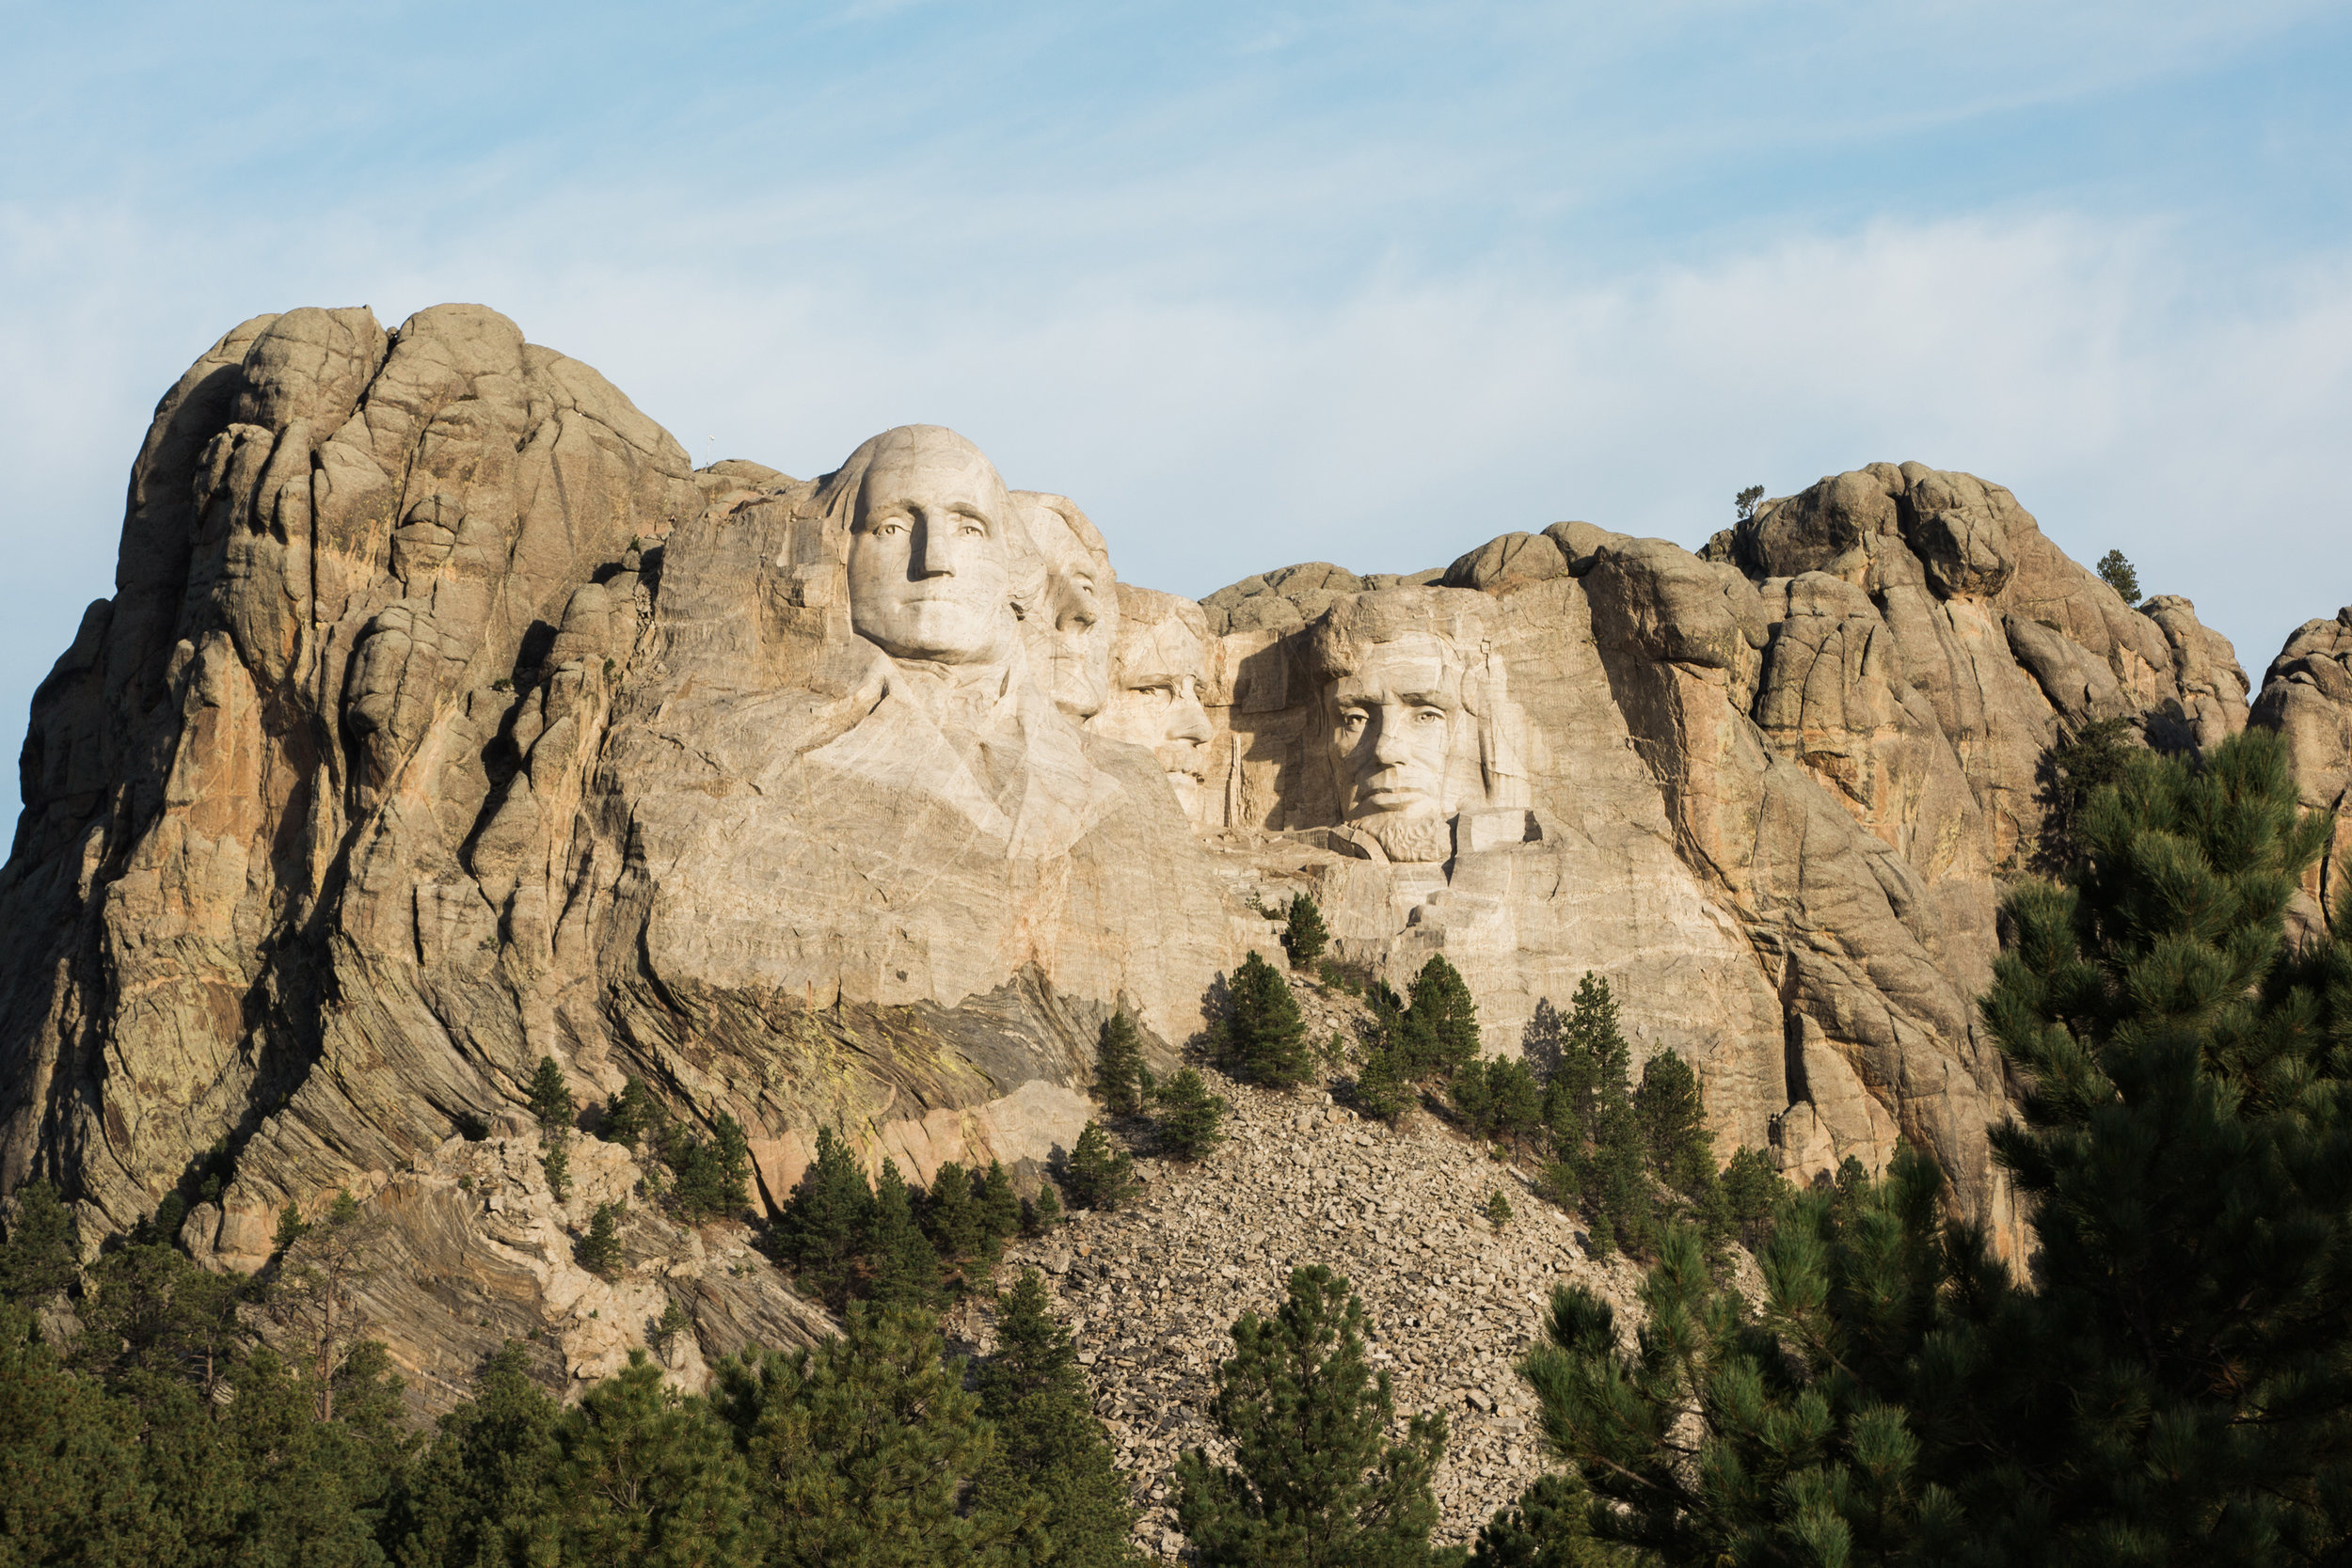 CindyGiovagnoli_outdoor_adventure_photography_Grand_Teton_Yellowstone_Glacier_National_Park_Montana_Wyoming_South_Dakota_Mount_Rushmore_Badlands-022.jpg